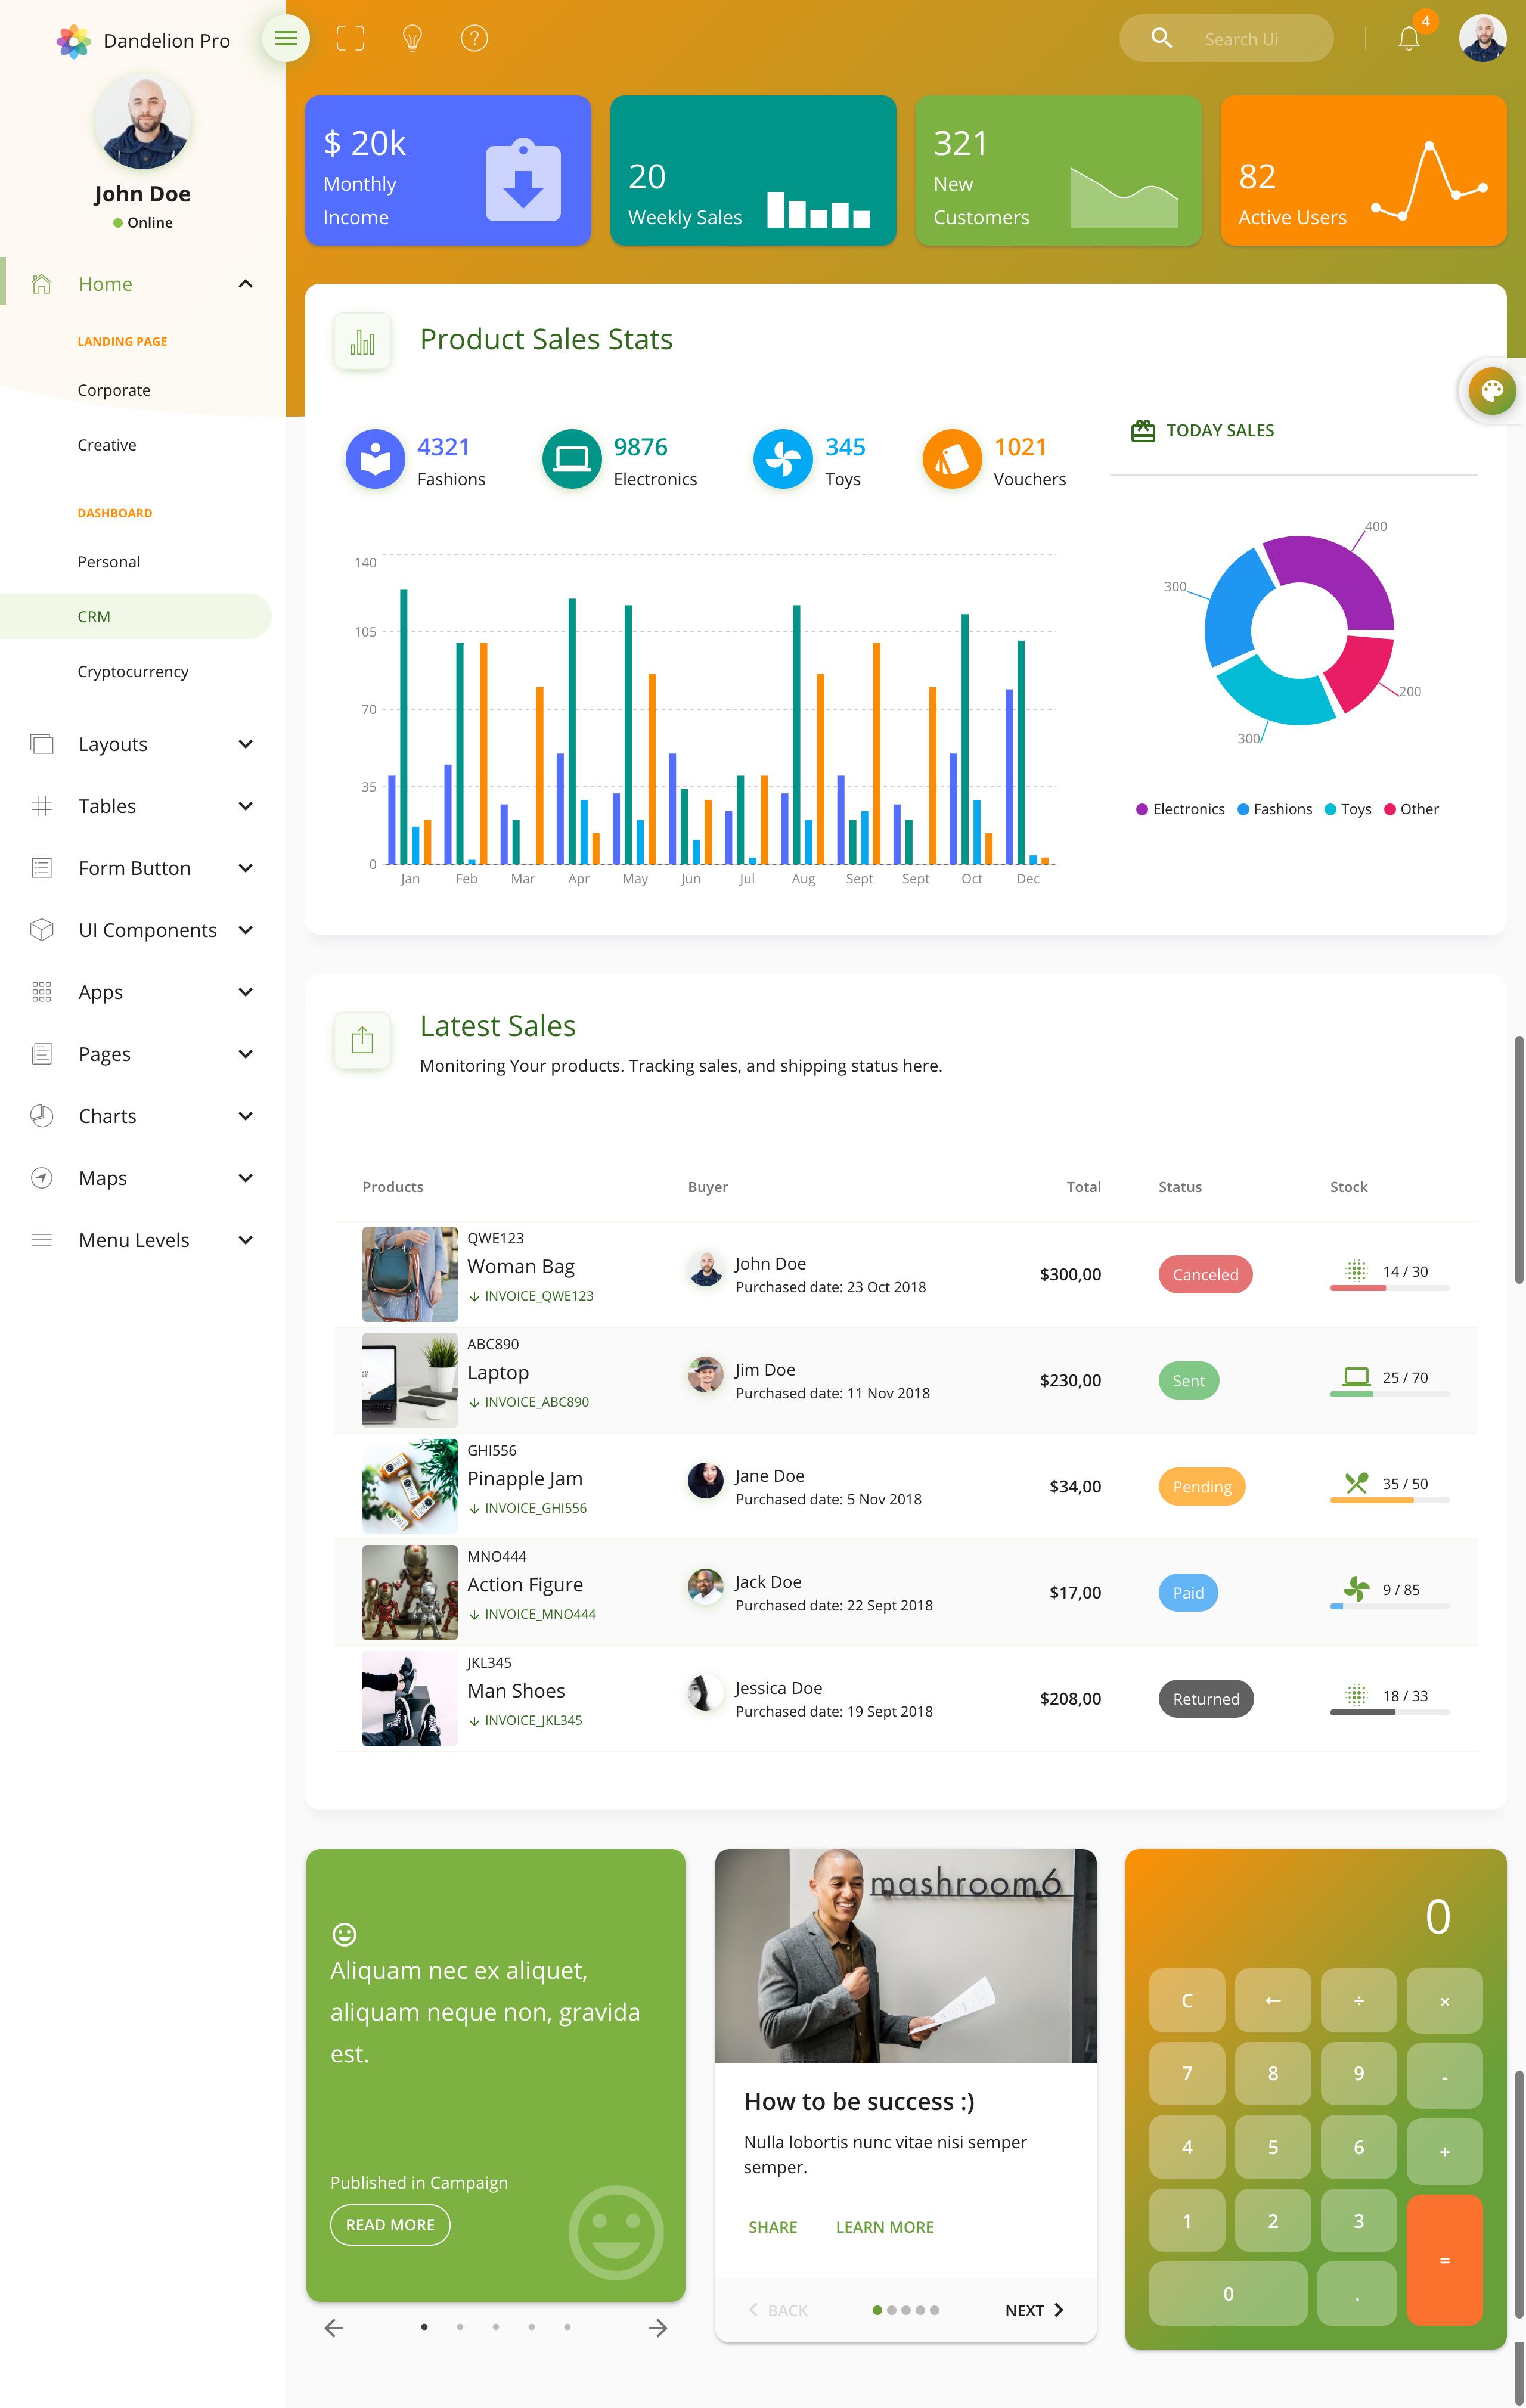 Dandelion Pro - React Admin Dashboard Template #React, #Pro